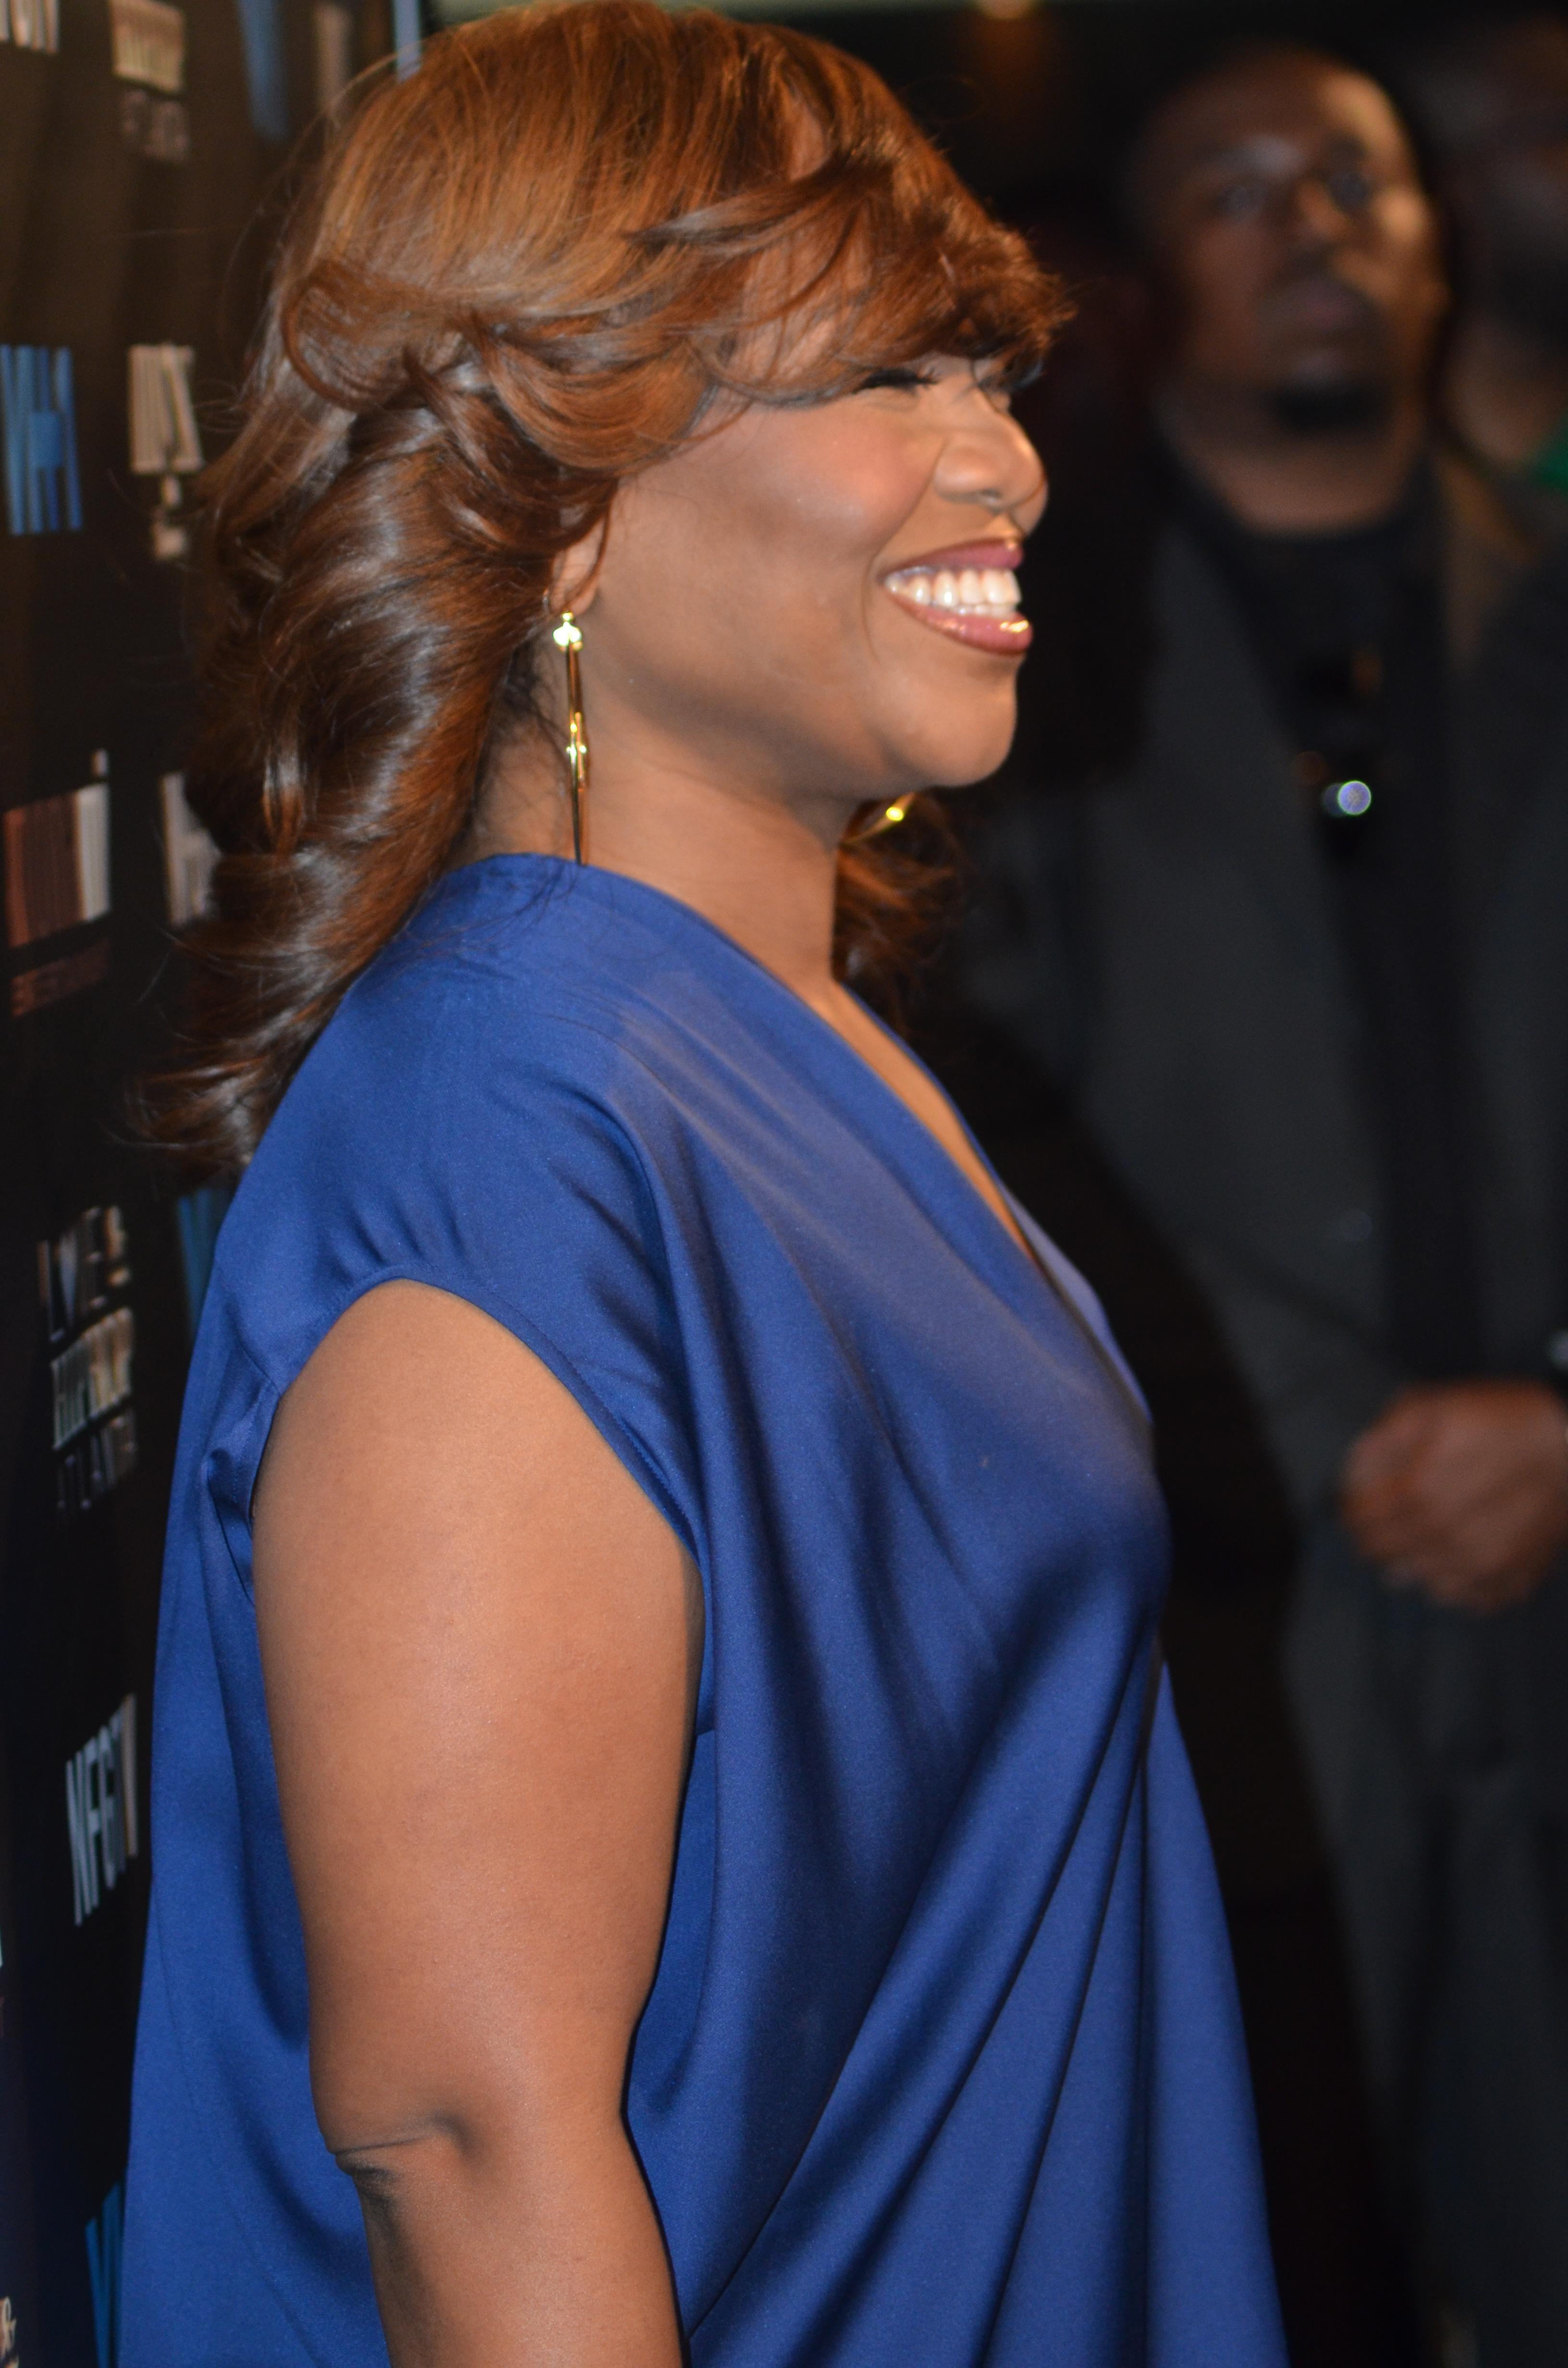 Love & Hip Hop Atlanta Season 2 Kicks Off With Premiere ... | 3264 x 4928 jpeg 4030kB